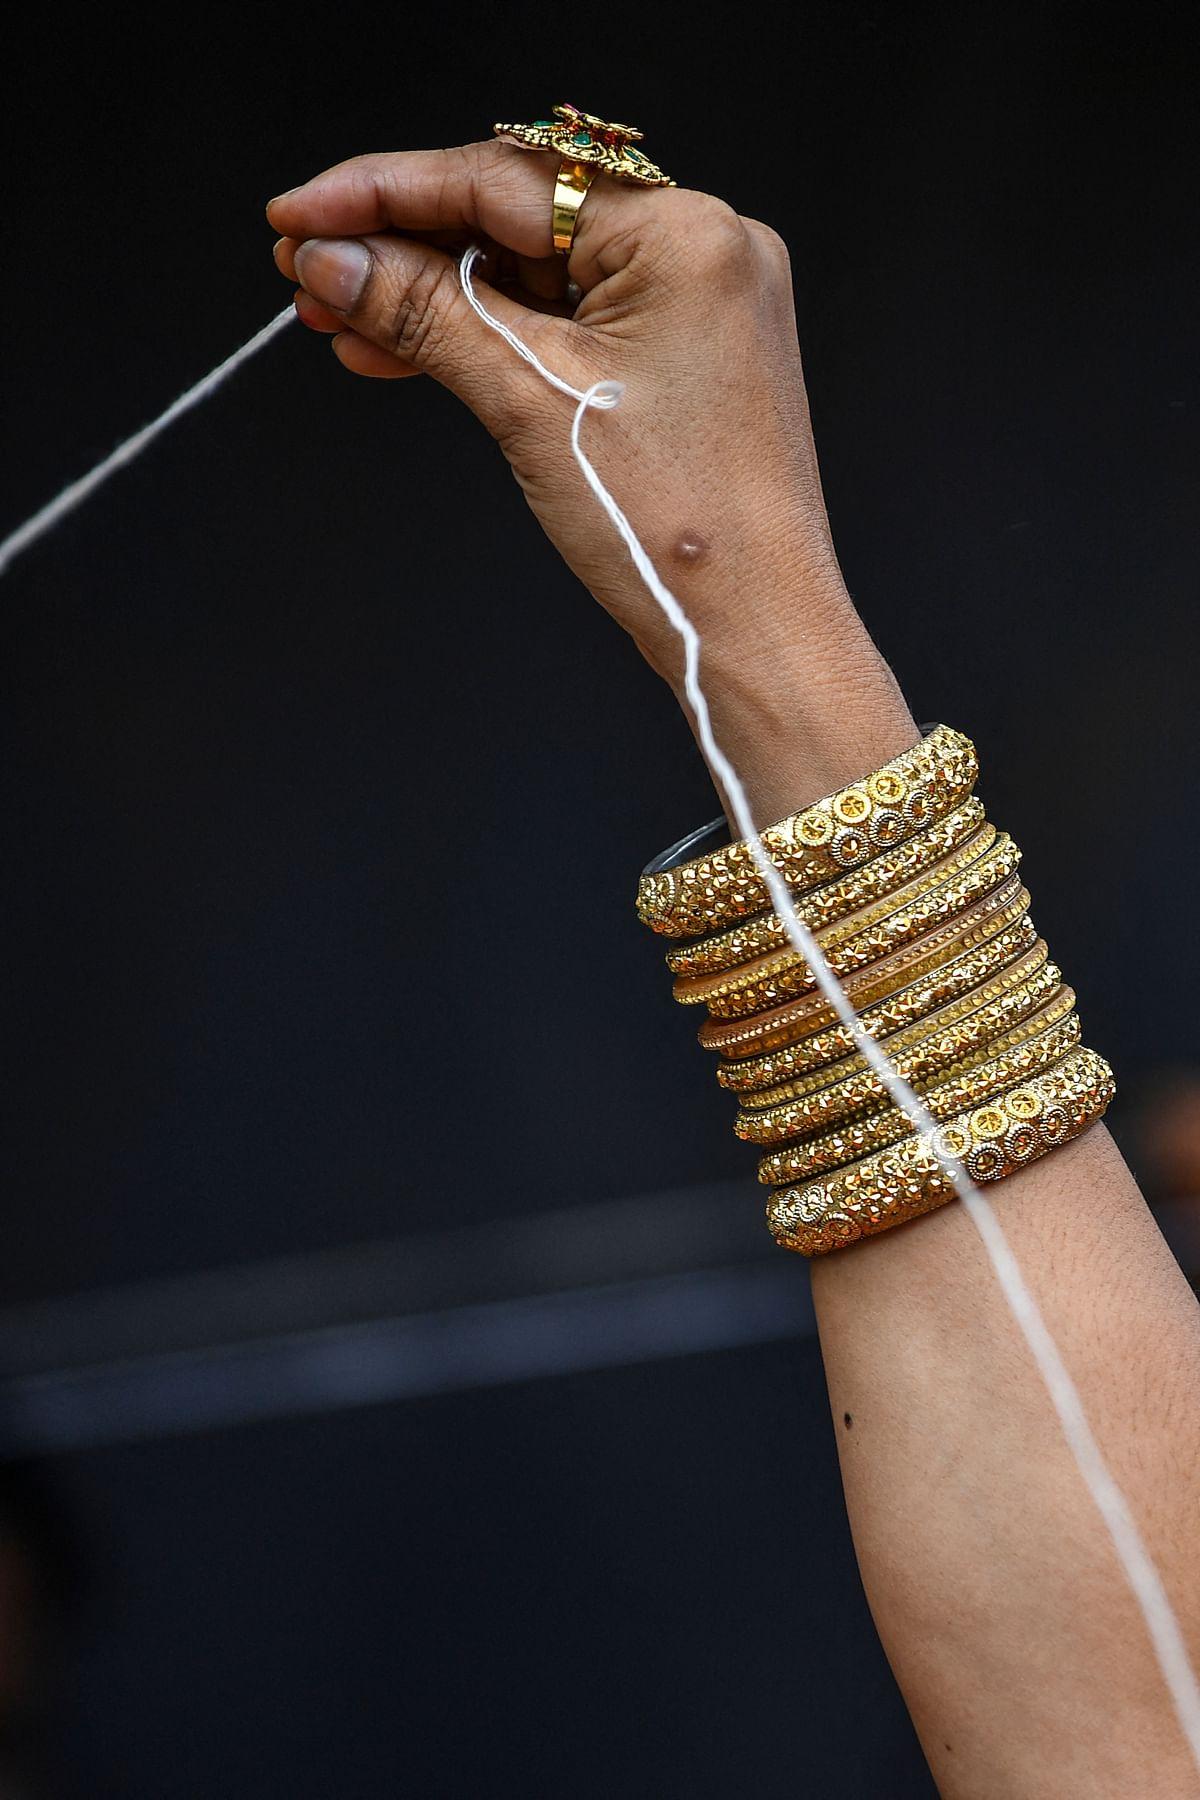 In Pics: Hindu women offer prayers on occasion of Vata Savitri Purnima